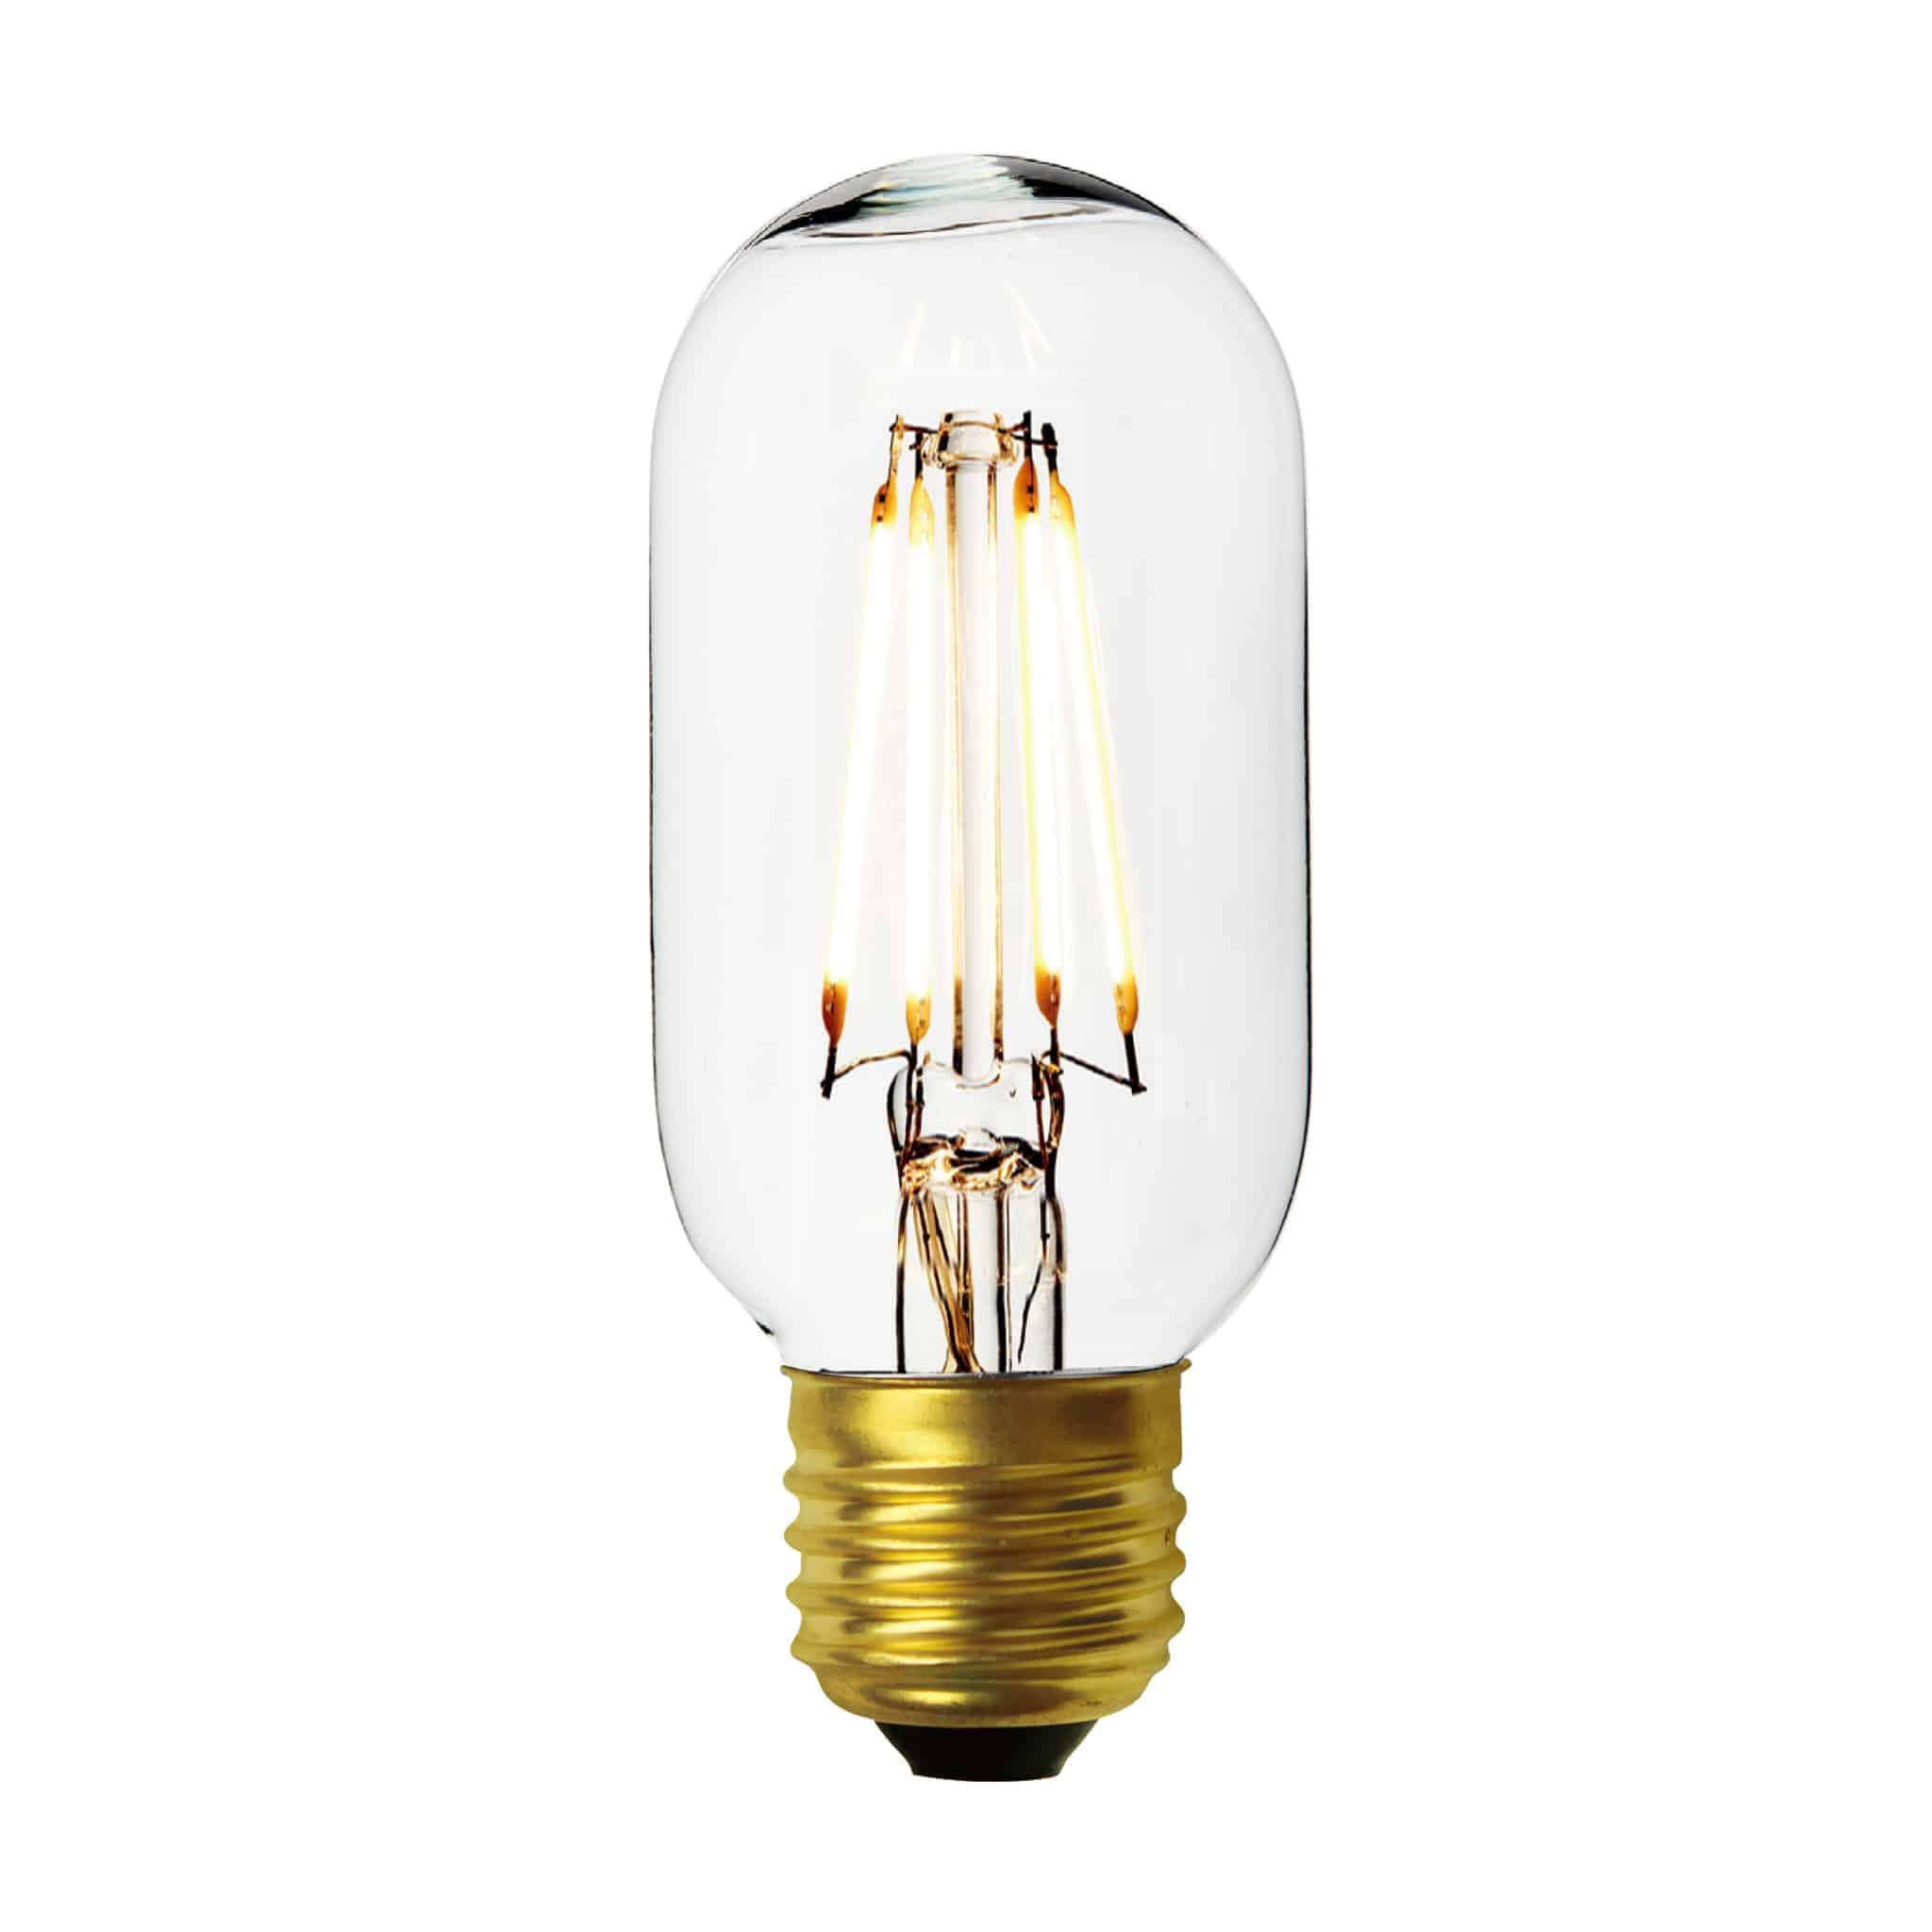 T45-7W-C Industville Bulb